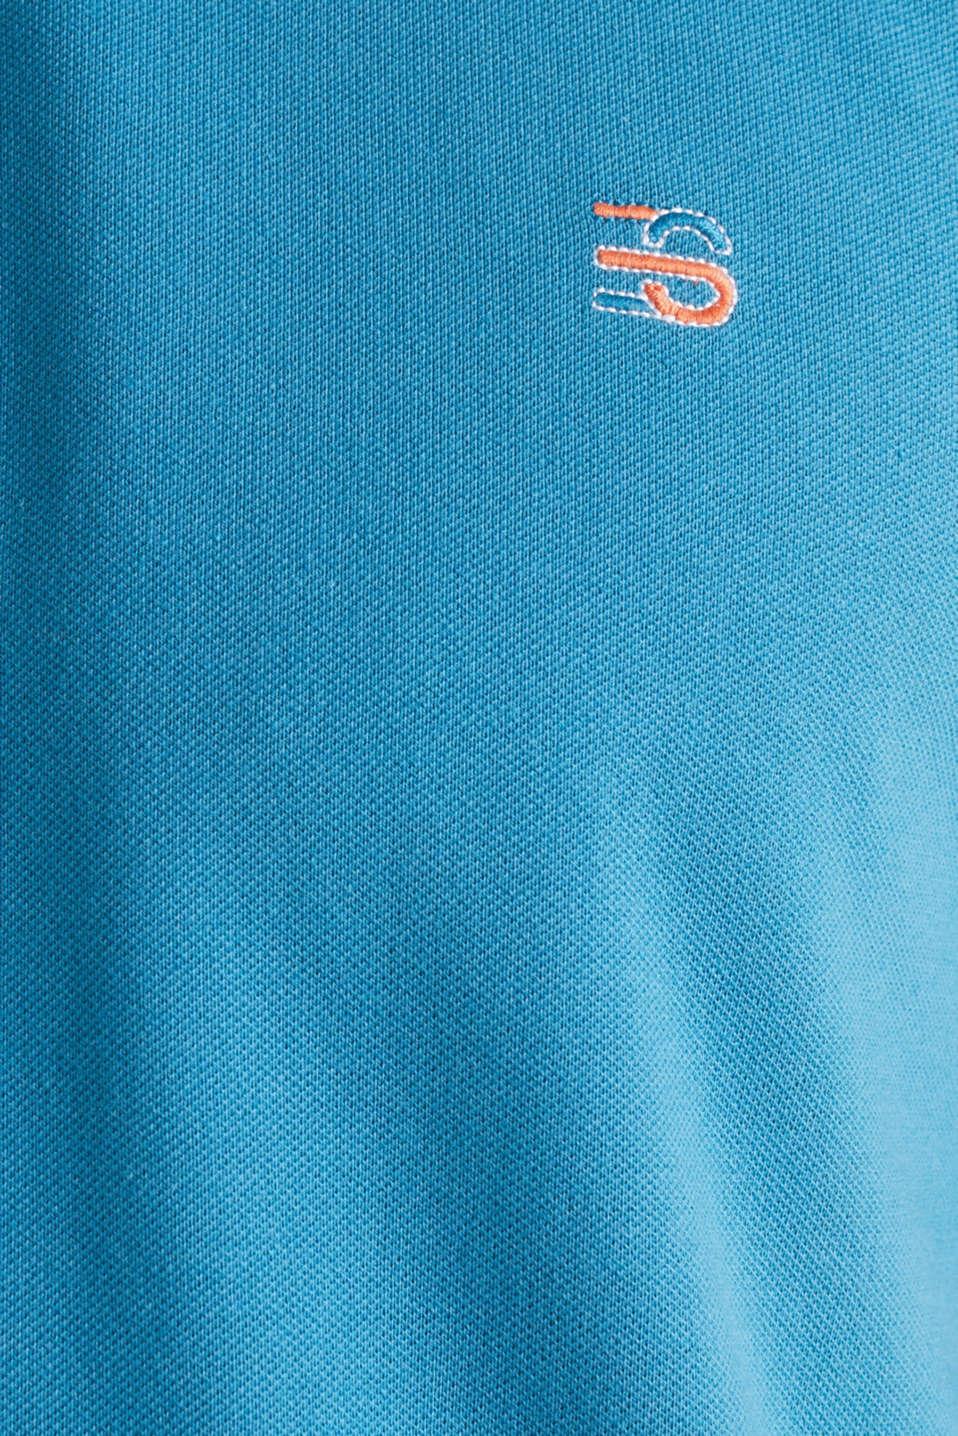 Stretch cotton piqué polo shirt, PETROL BLUE 2, detail image number 5